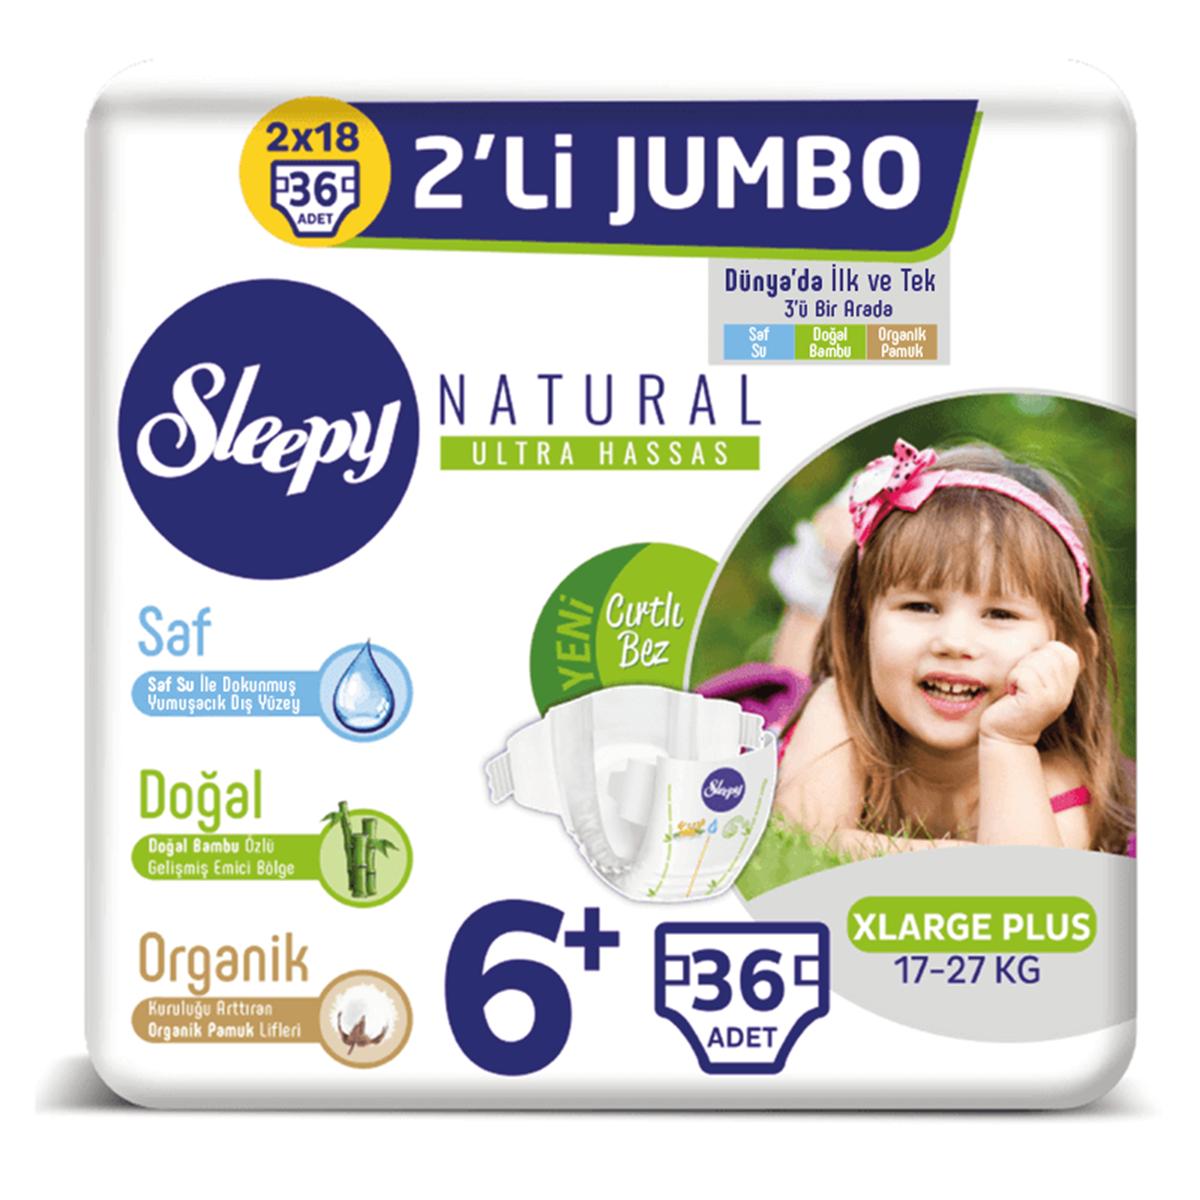 Sleepy Natural Bebek Bezi 6+ Numara Xlarge Plus 2'Lİ JUMBO 36 Adet